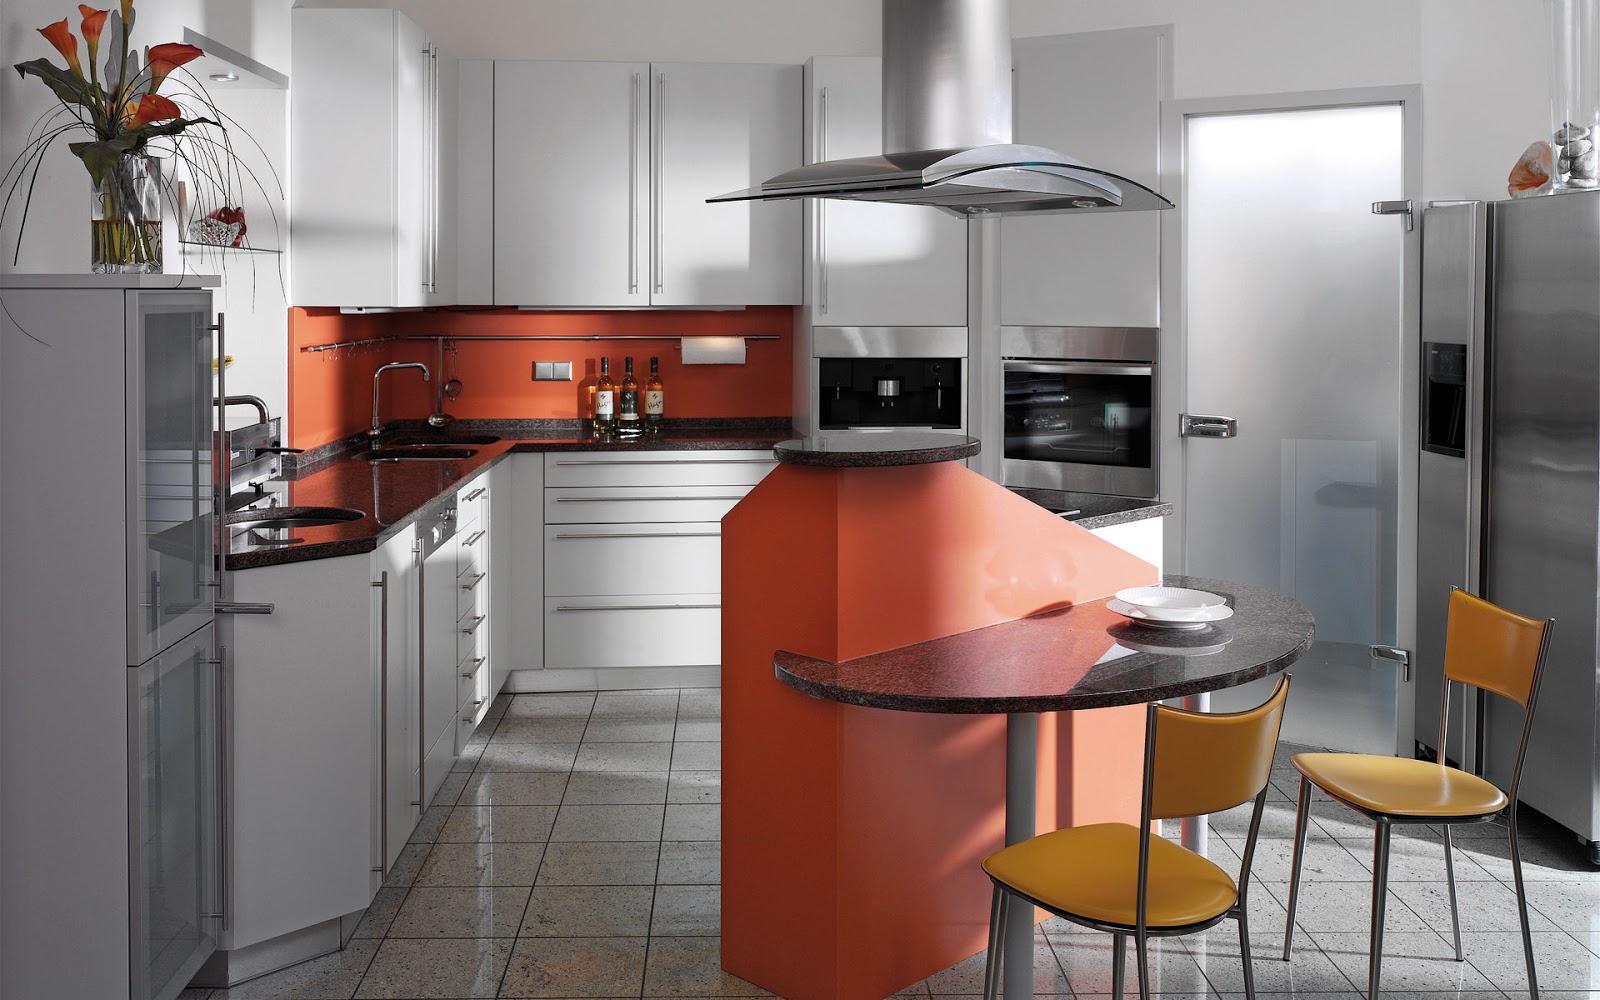 Barras de cocina modernas gallery of resultado de imagen - Barras para cocina ...